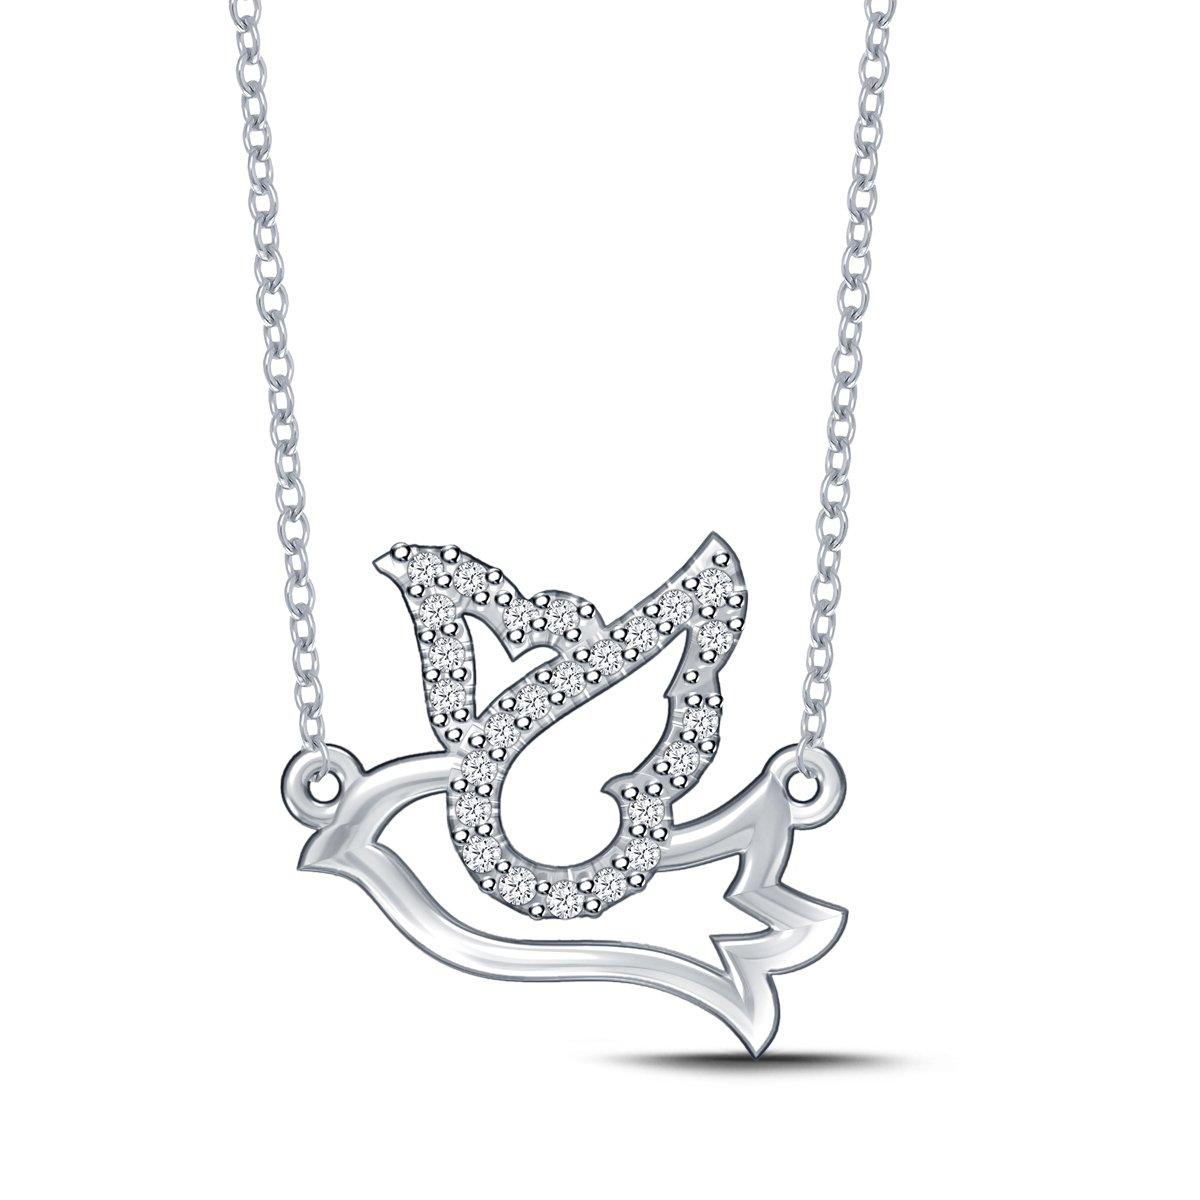 Diamond Dove Pendant Necklace in 925 Silver (0.08cttw, IJ / I2-I3) 18''